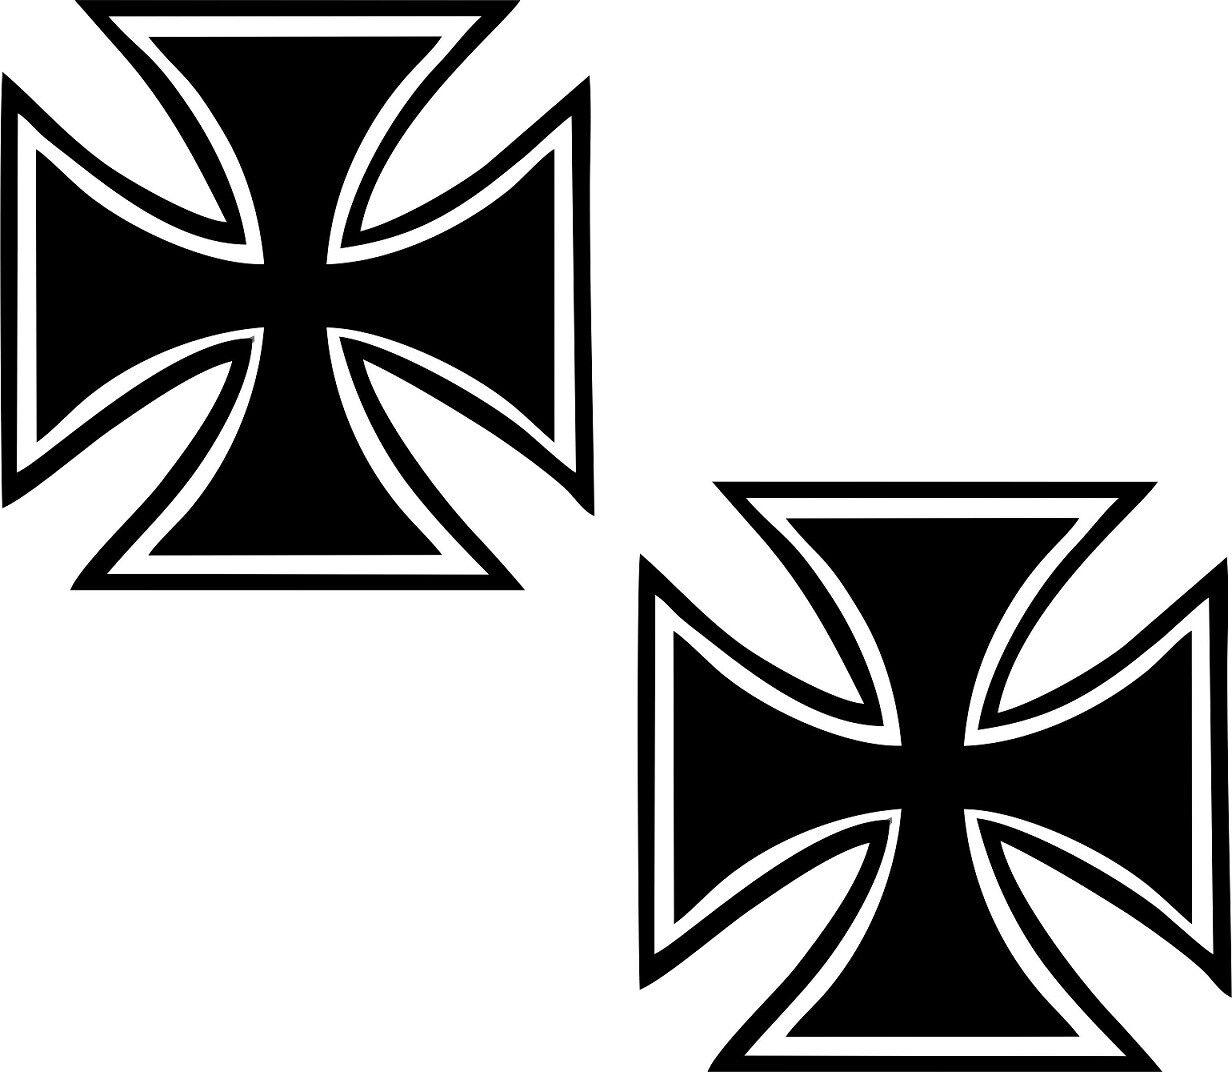 Iron Crossskulleisernes Kreuz Aufkleberoldschoolkult